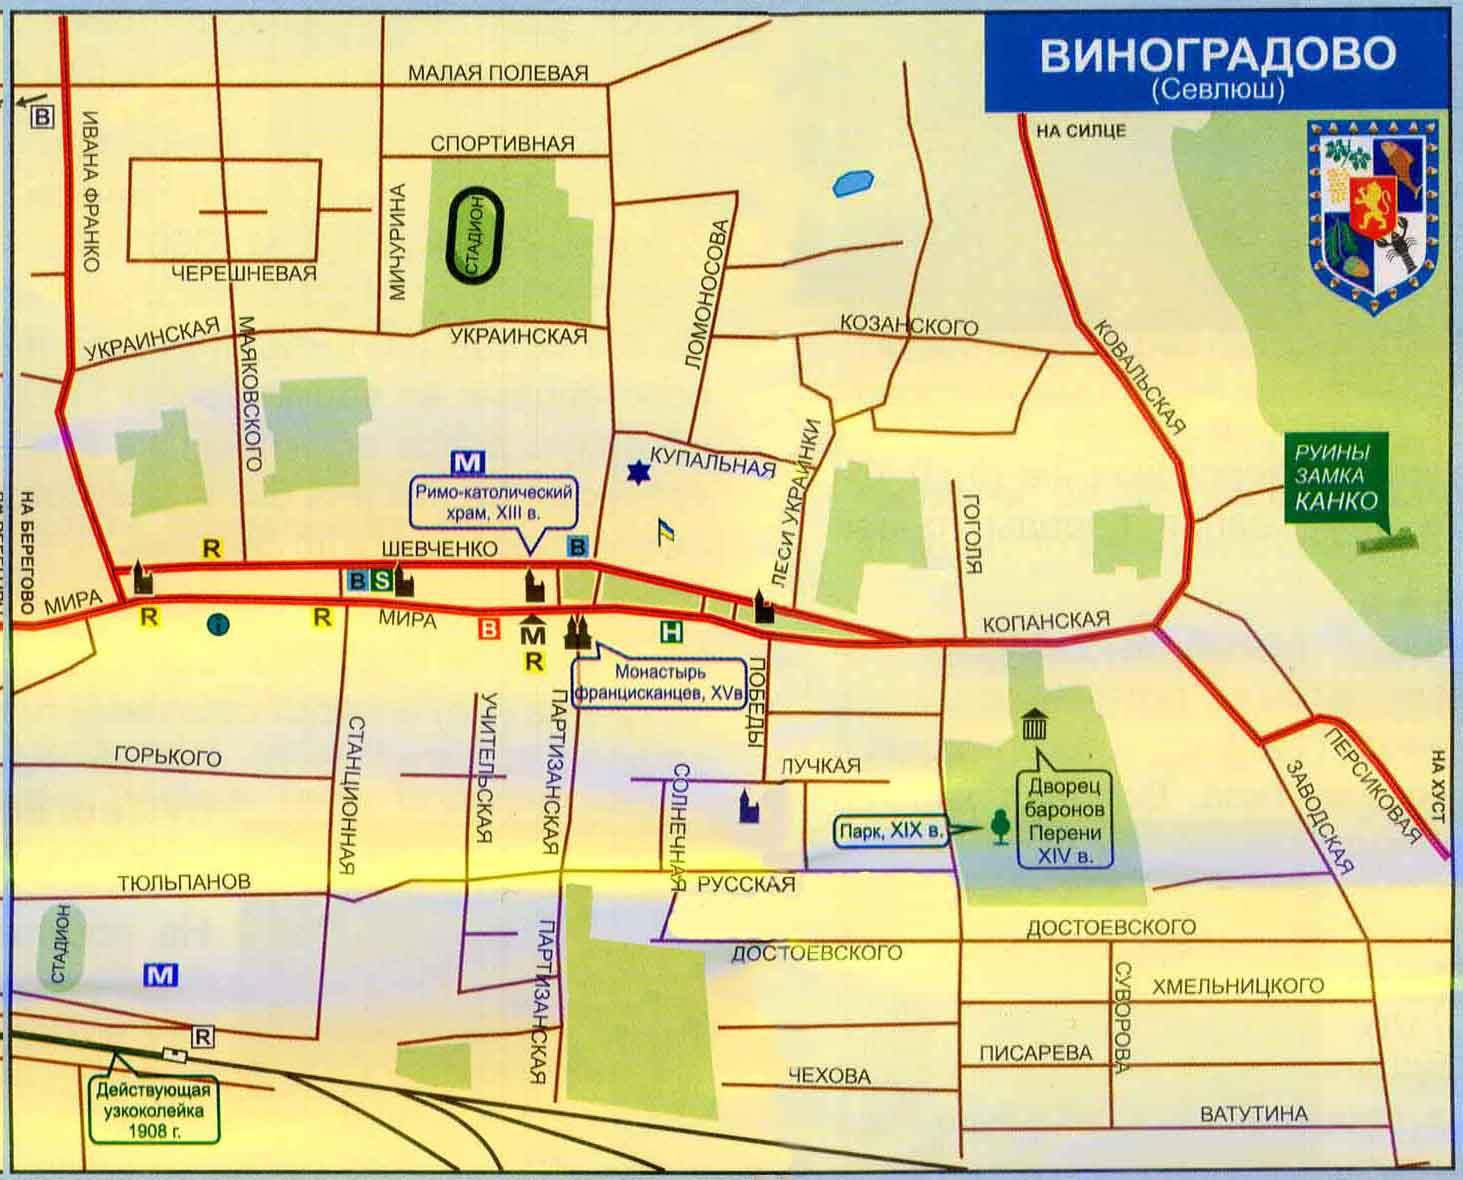 Карта-схема Виноградова: http://asinfo.com.ua/karpaty/article.php?id=524&sid=755